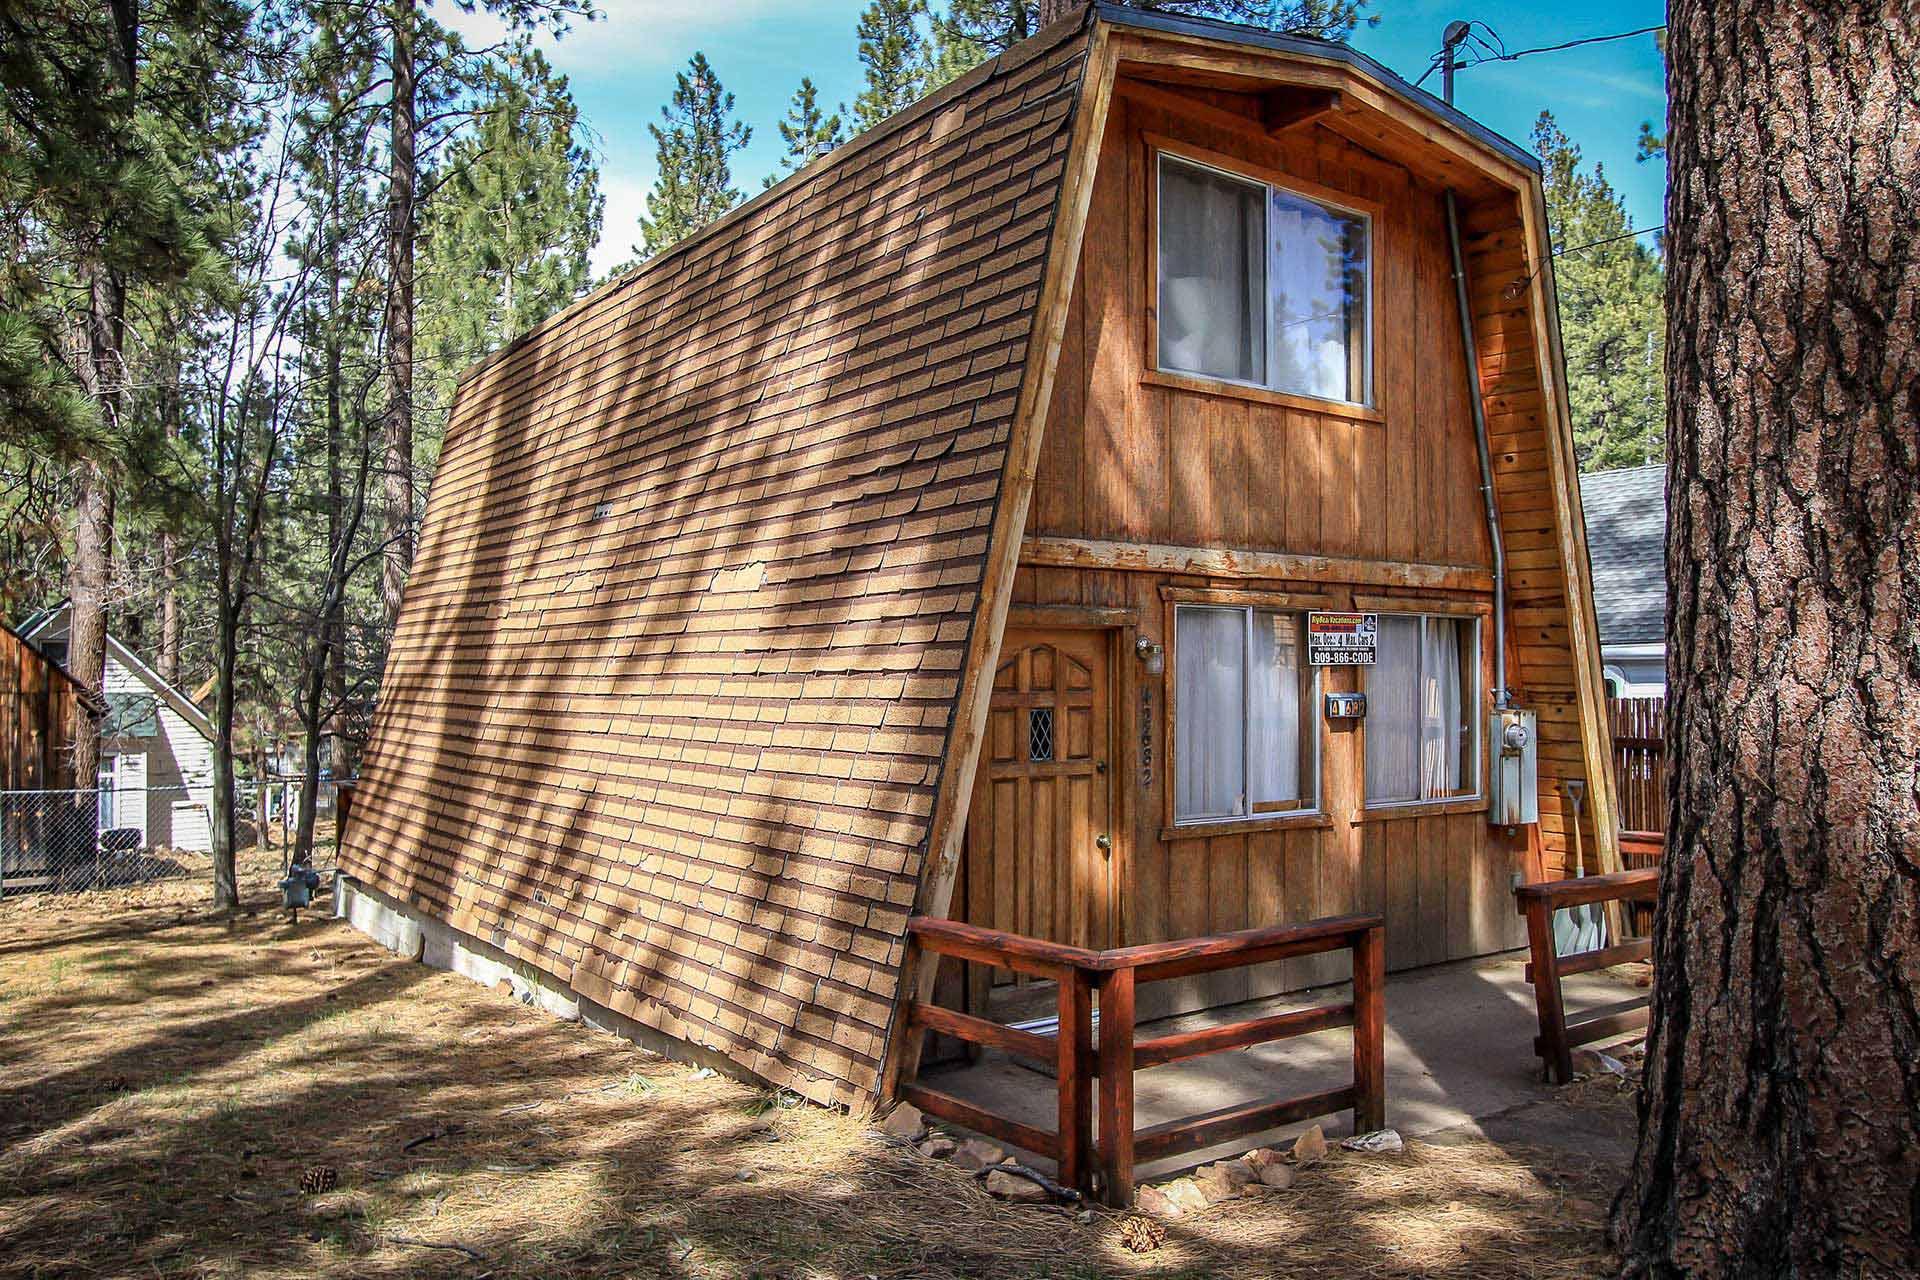 1174 cedar haus ra45949 redawning for Big bear lakefront cabin rentals